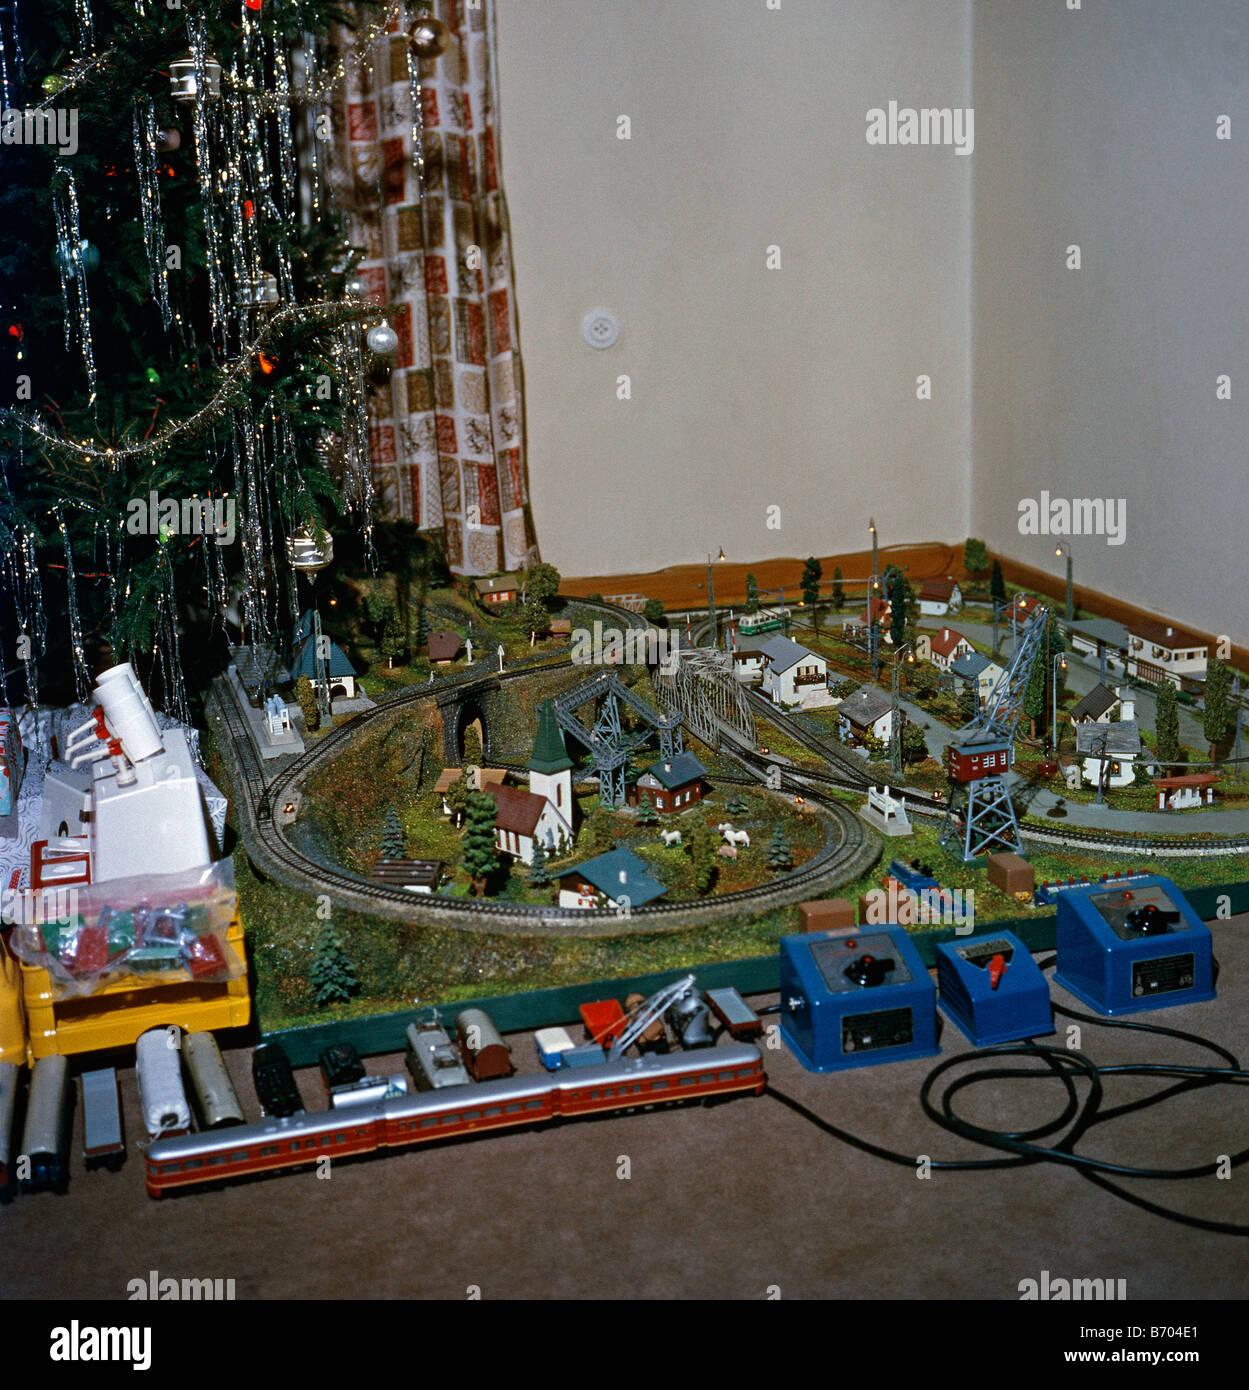 living room christmas tree 1960s stockfotos living room christmas tree 1960s bilder alamy. Black Bedroom Furniture Sets. Home Design Ideas